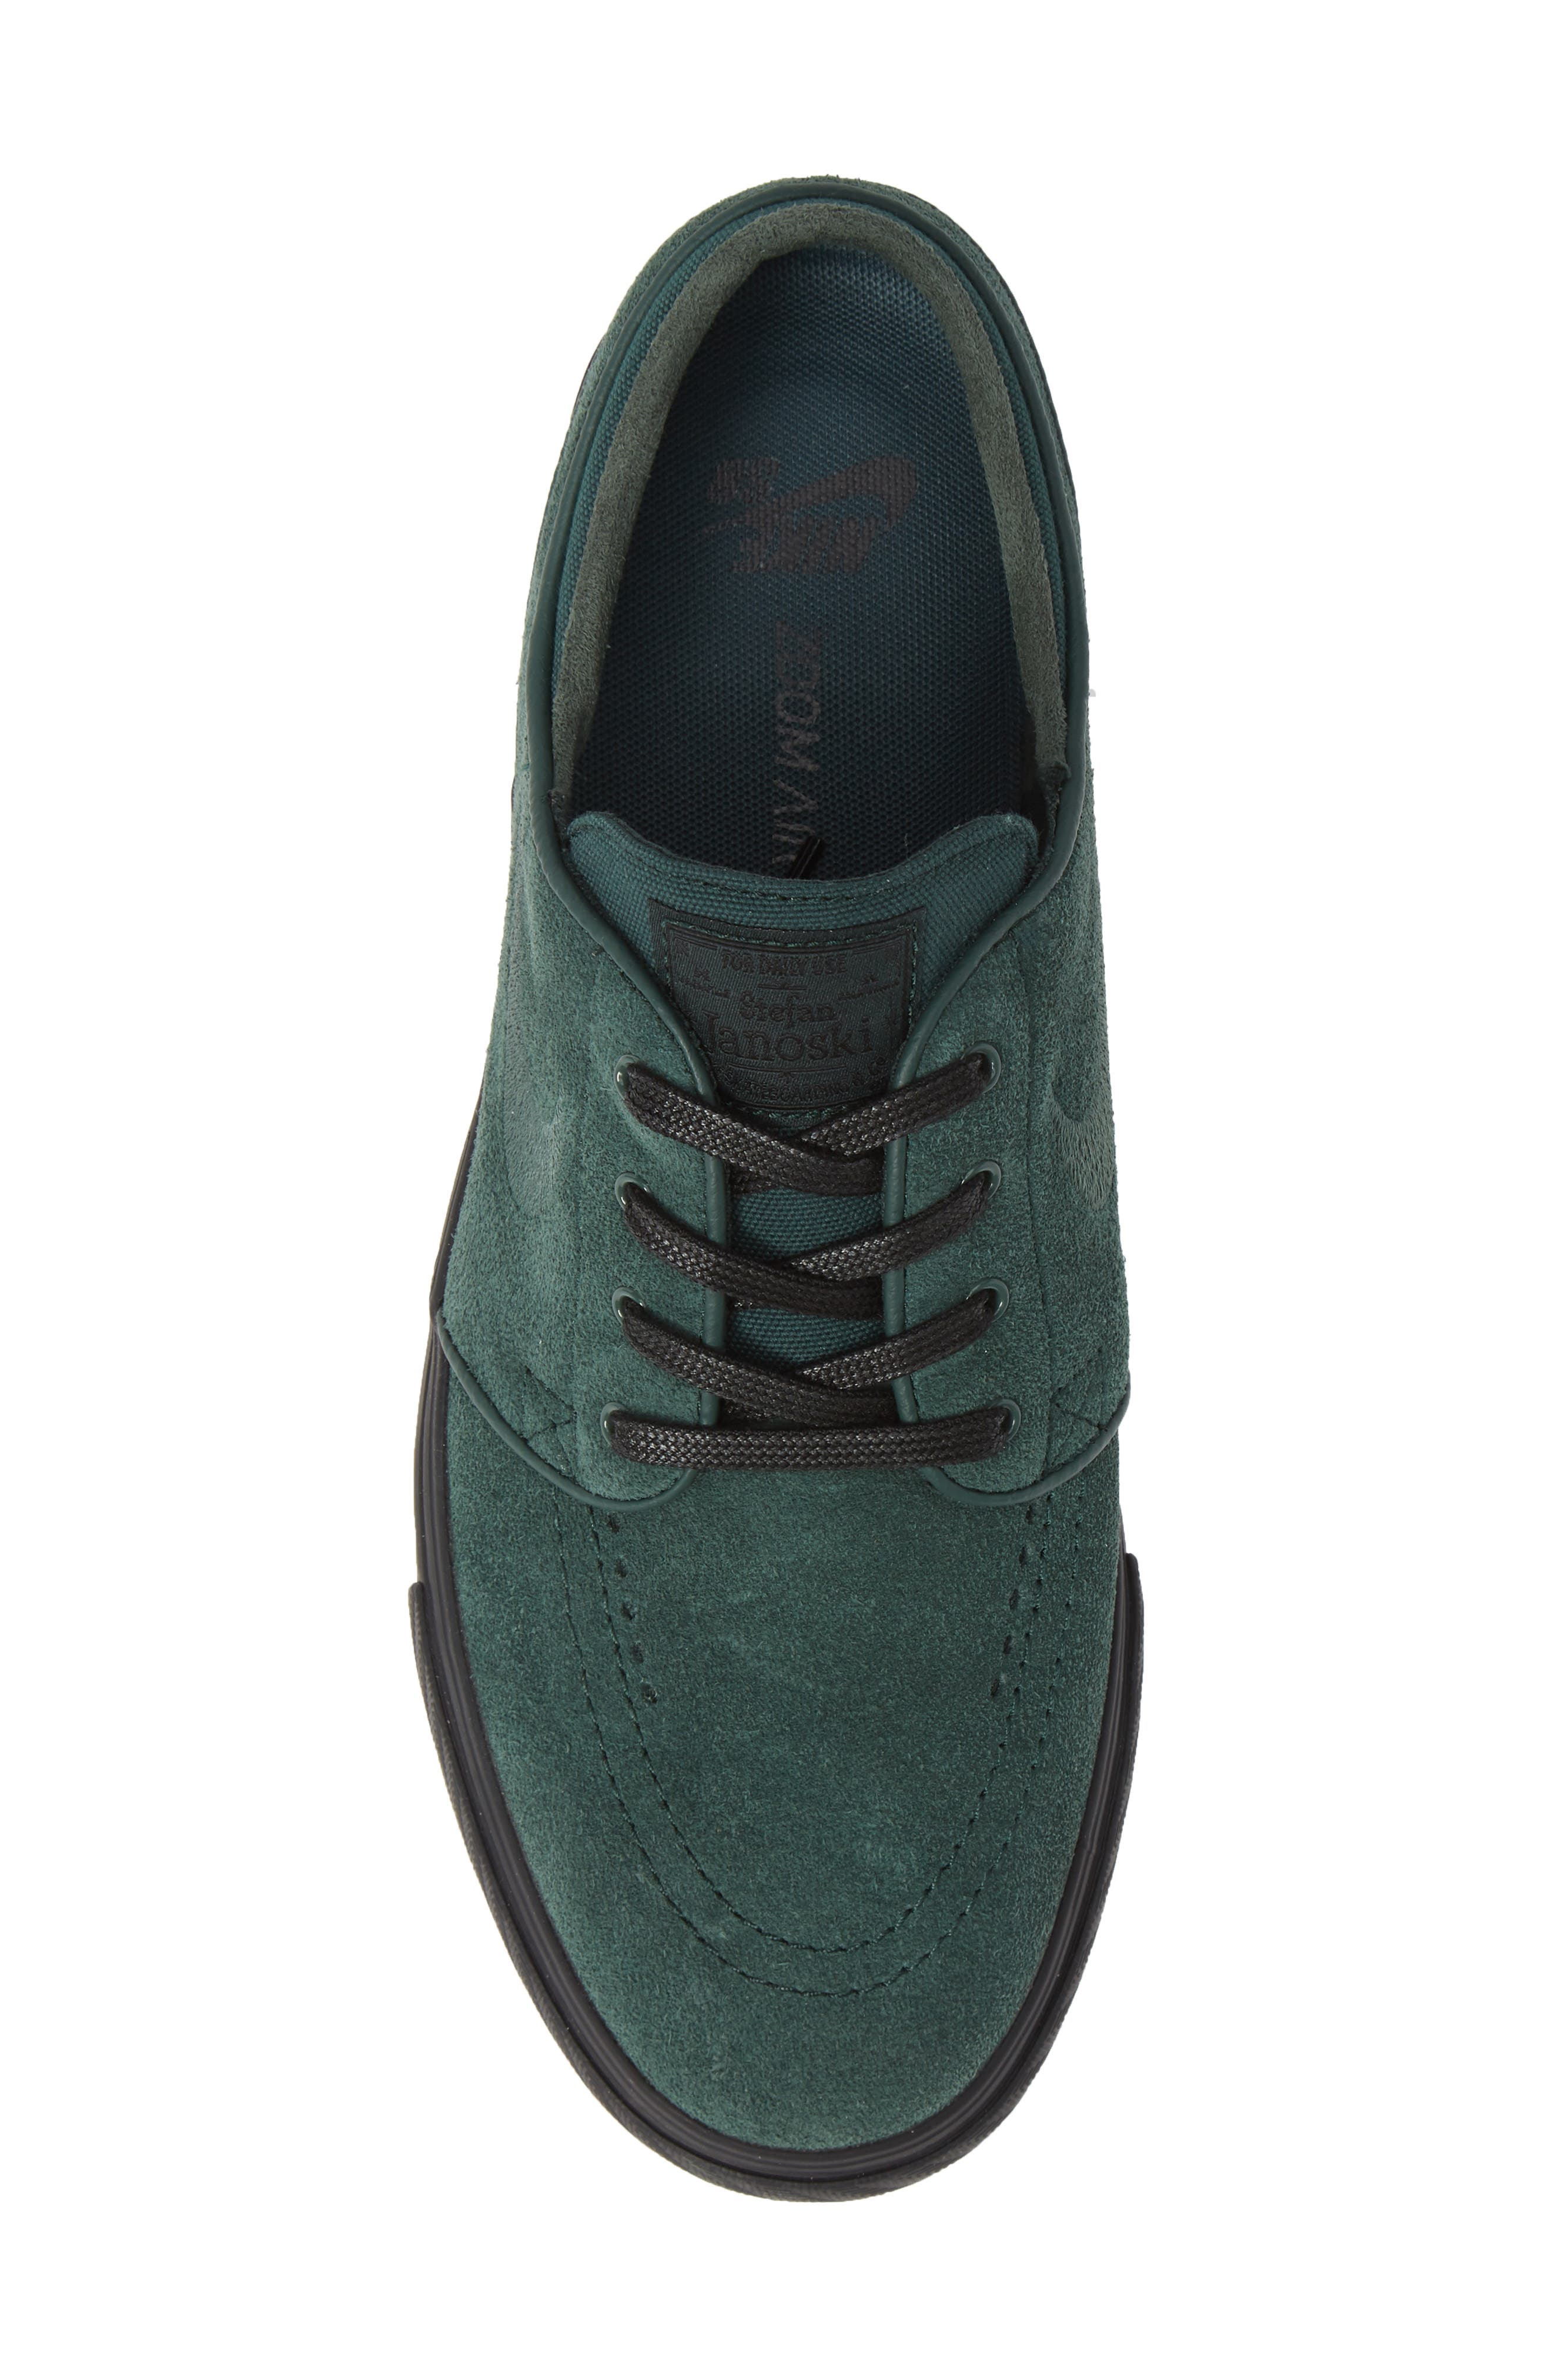 'Zoom - Stefan Janoski' Skate Shoe,                             Alternate thumbnail 3, color,                             Midnight Green/ Black